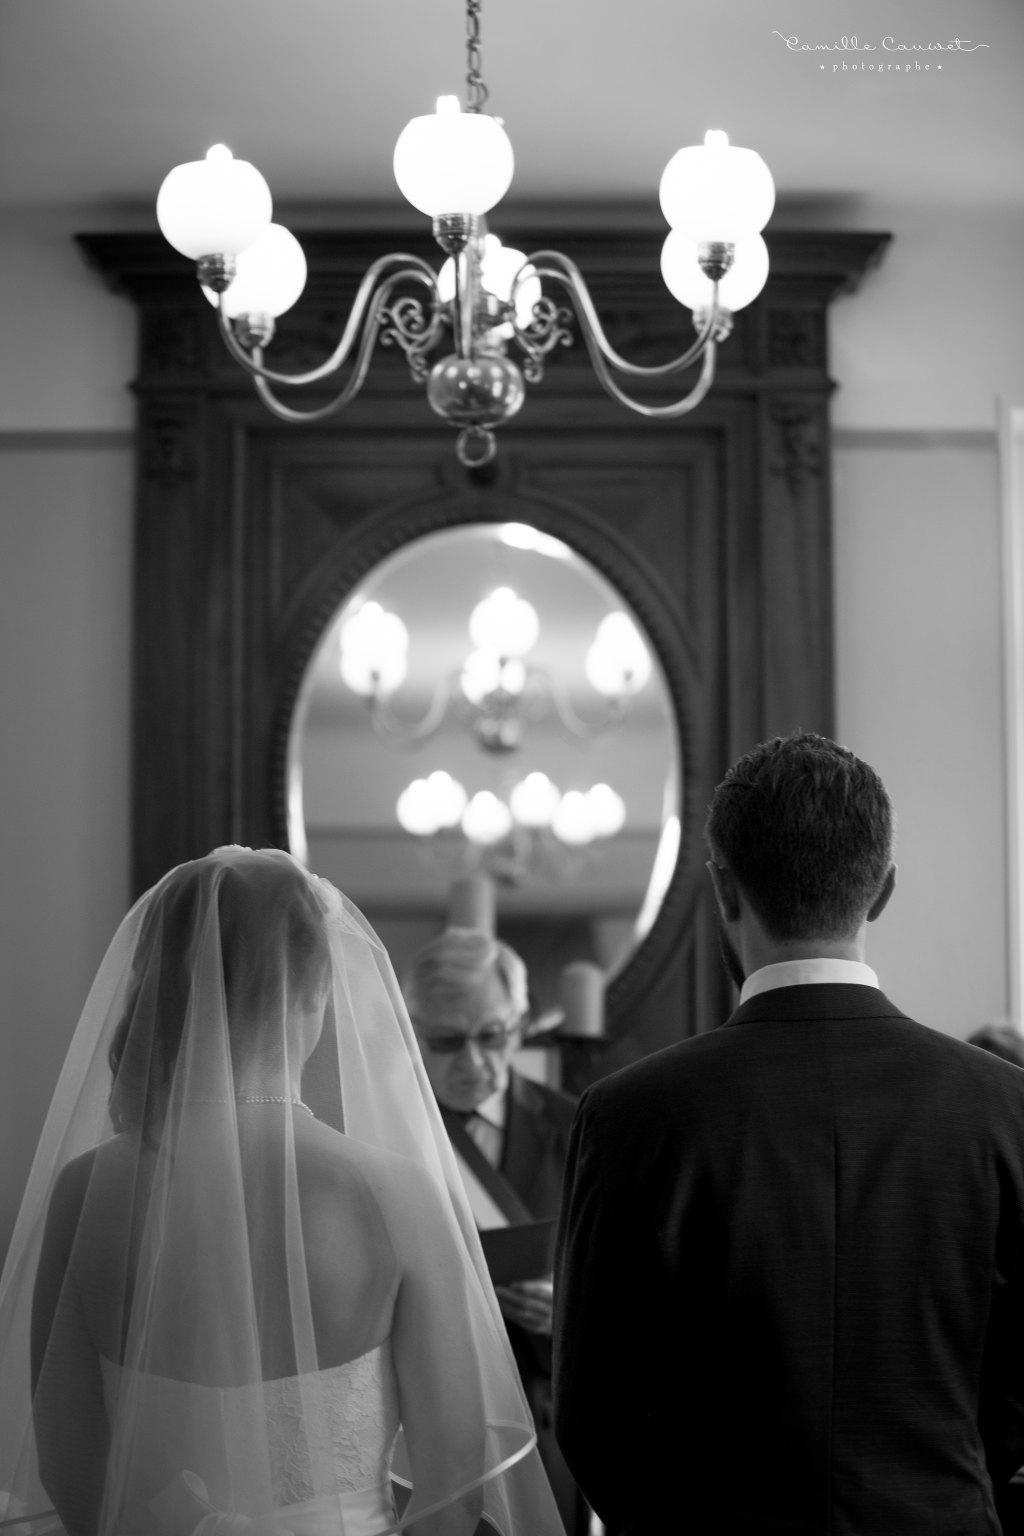 mariage cérémonie civile 77